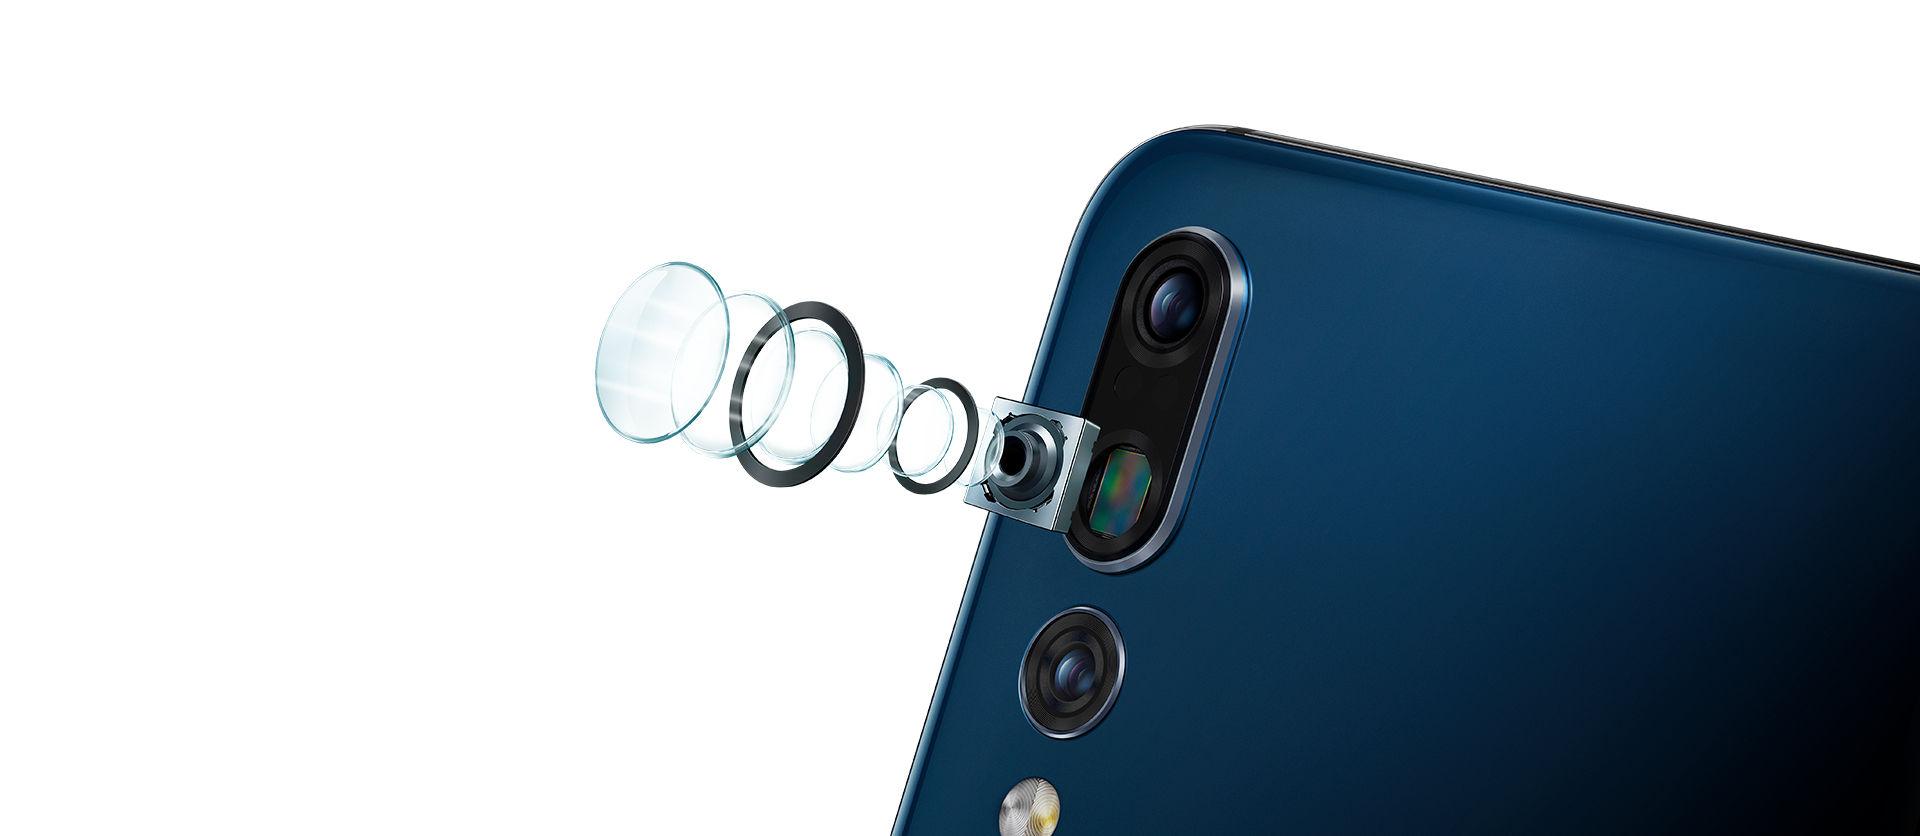 Huawei P20 Pro Camera Sensor